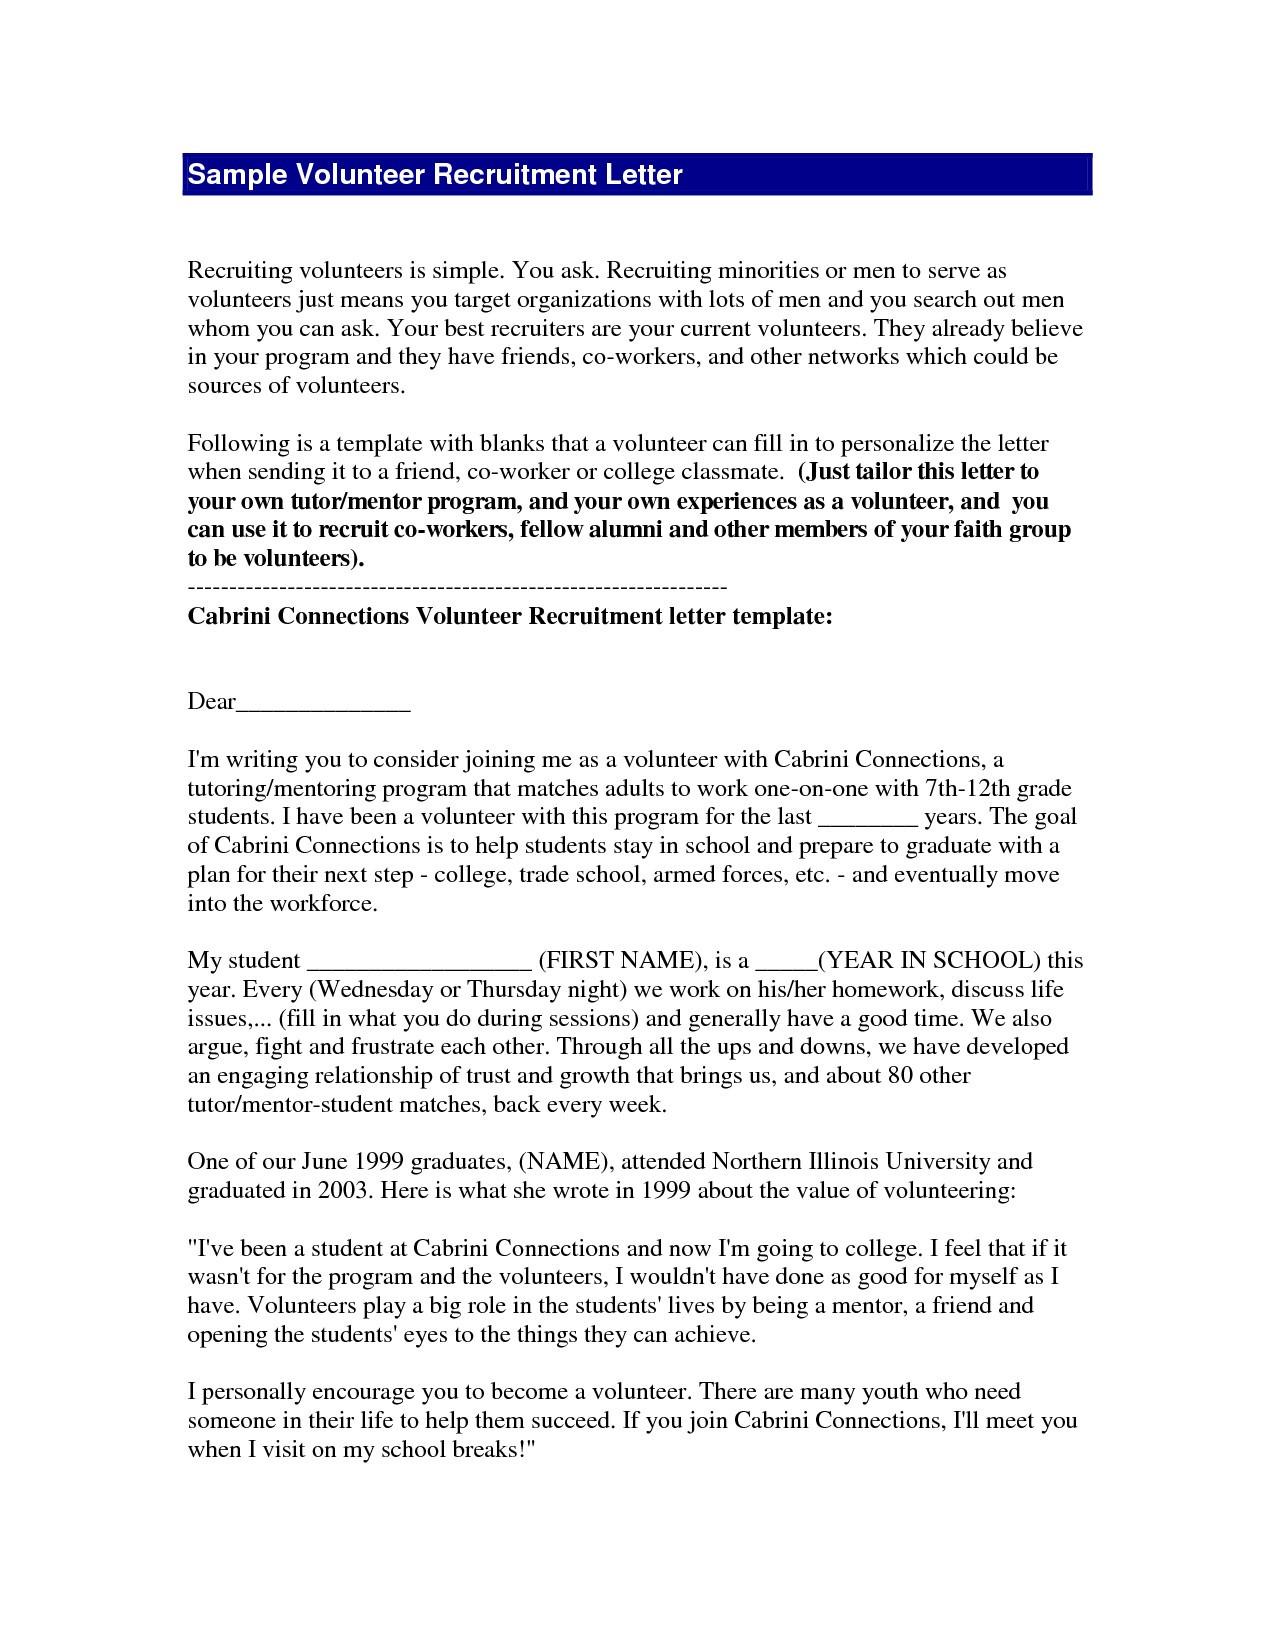 Sample Volunteer Letter Community Service from i0.wp.com